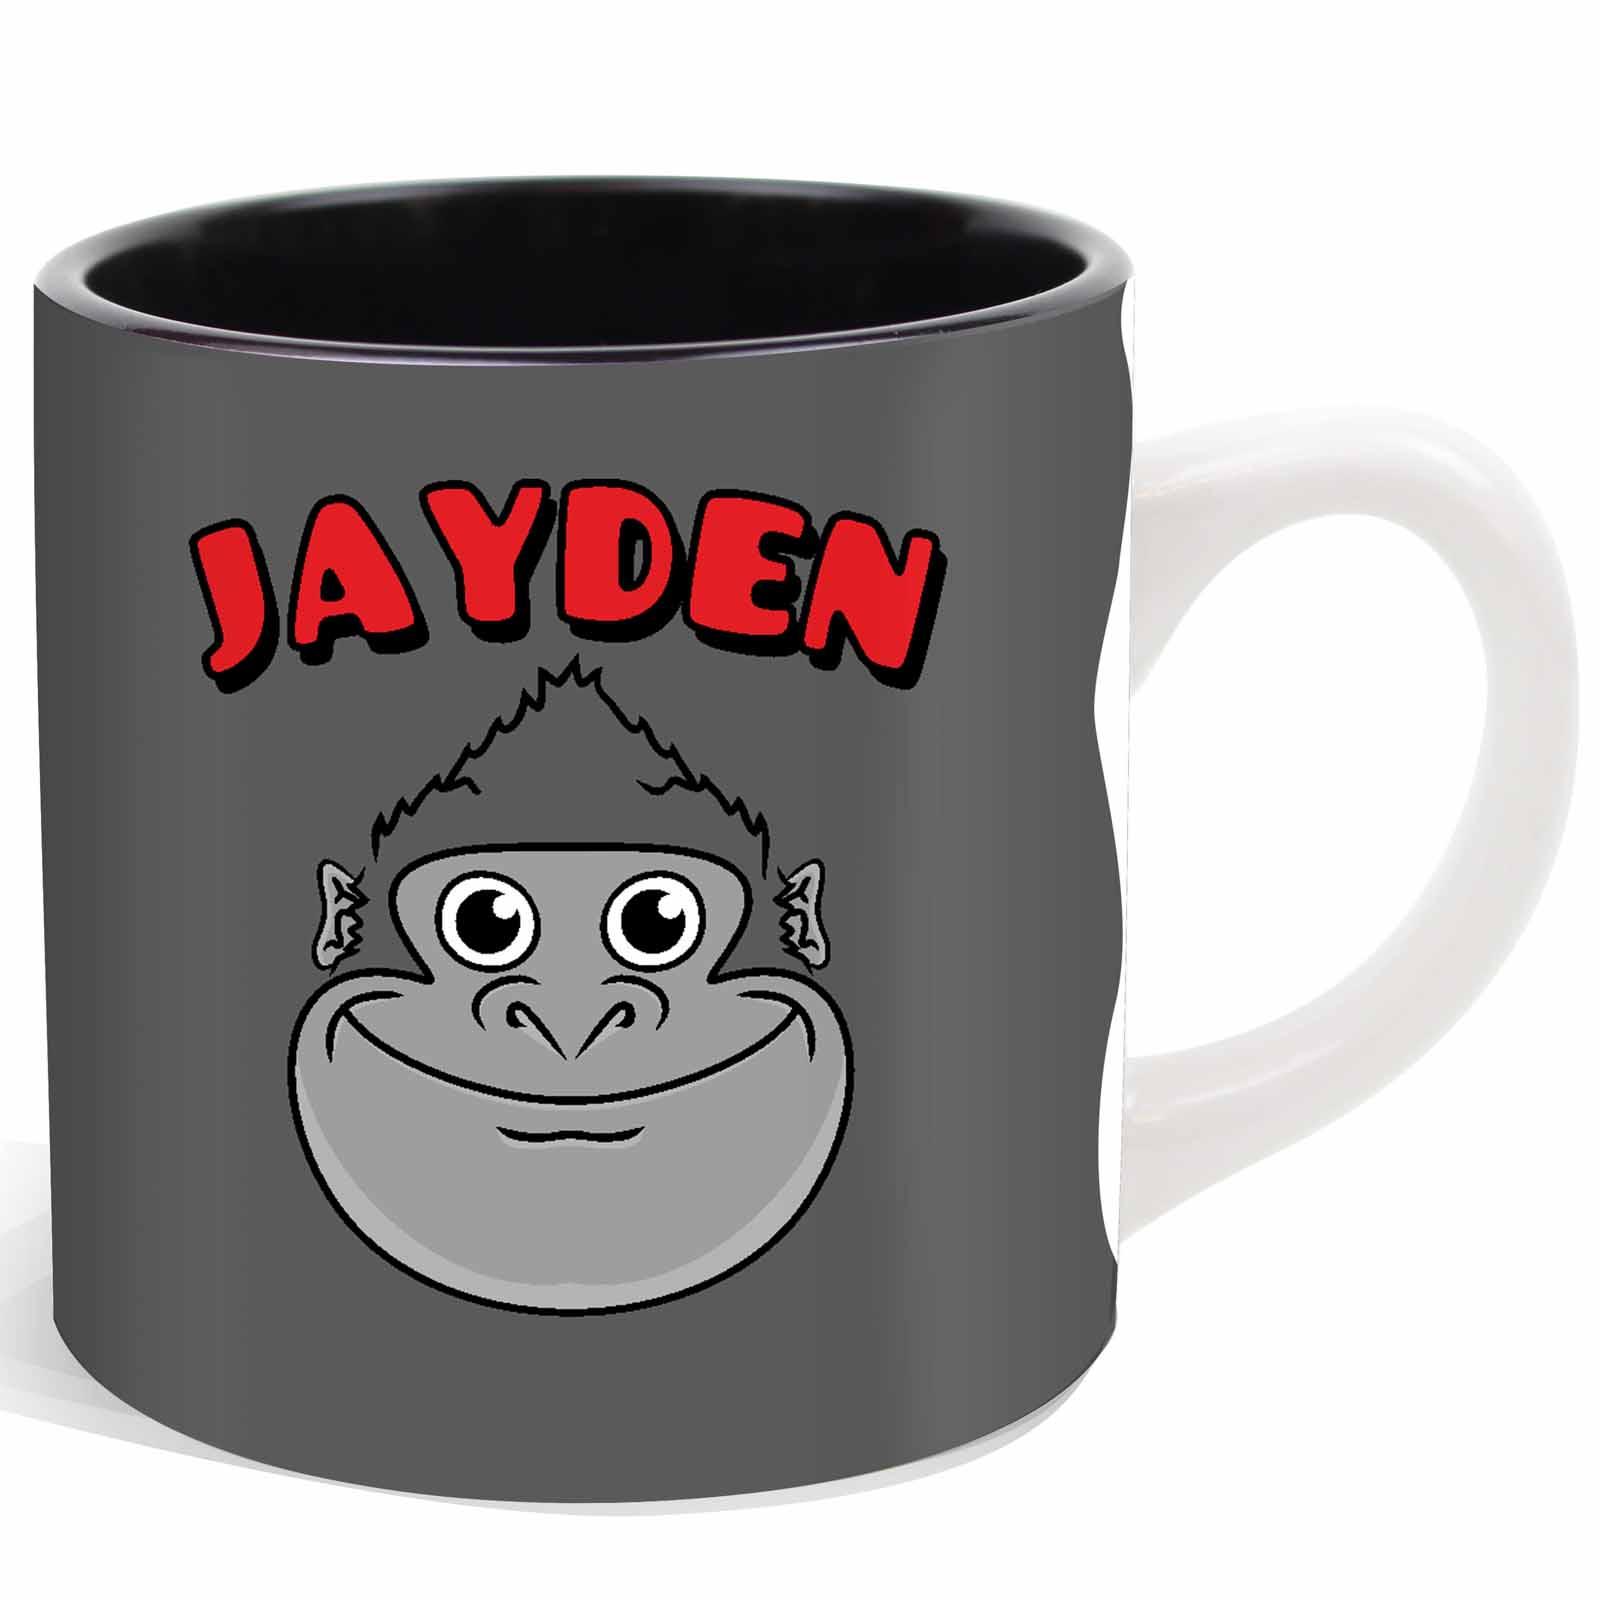 Animal Coffee Mugs Personalised Ani Mates Childrens Mug Cup Gift Boxed Kids